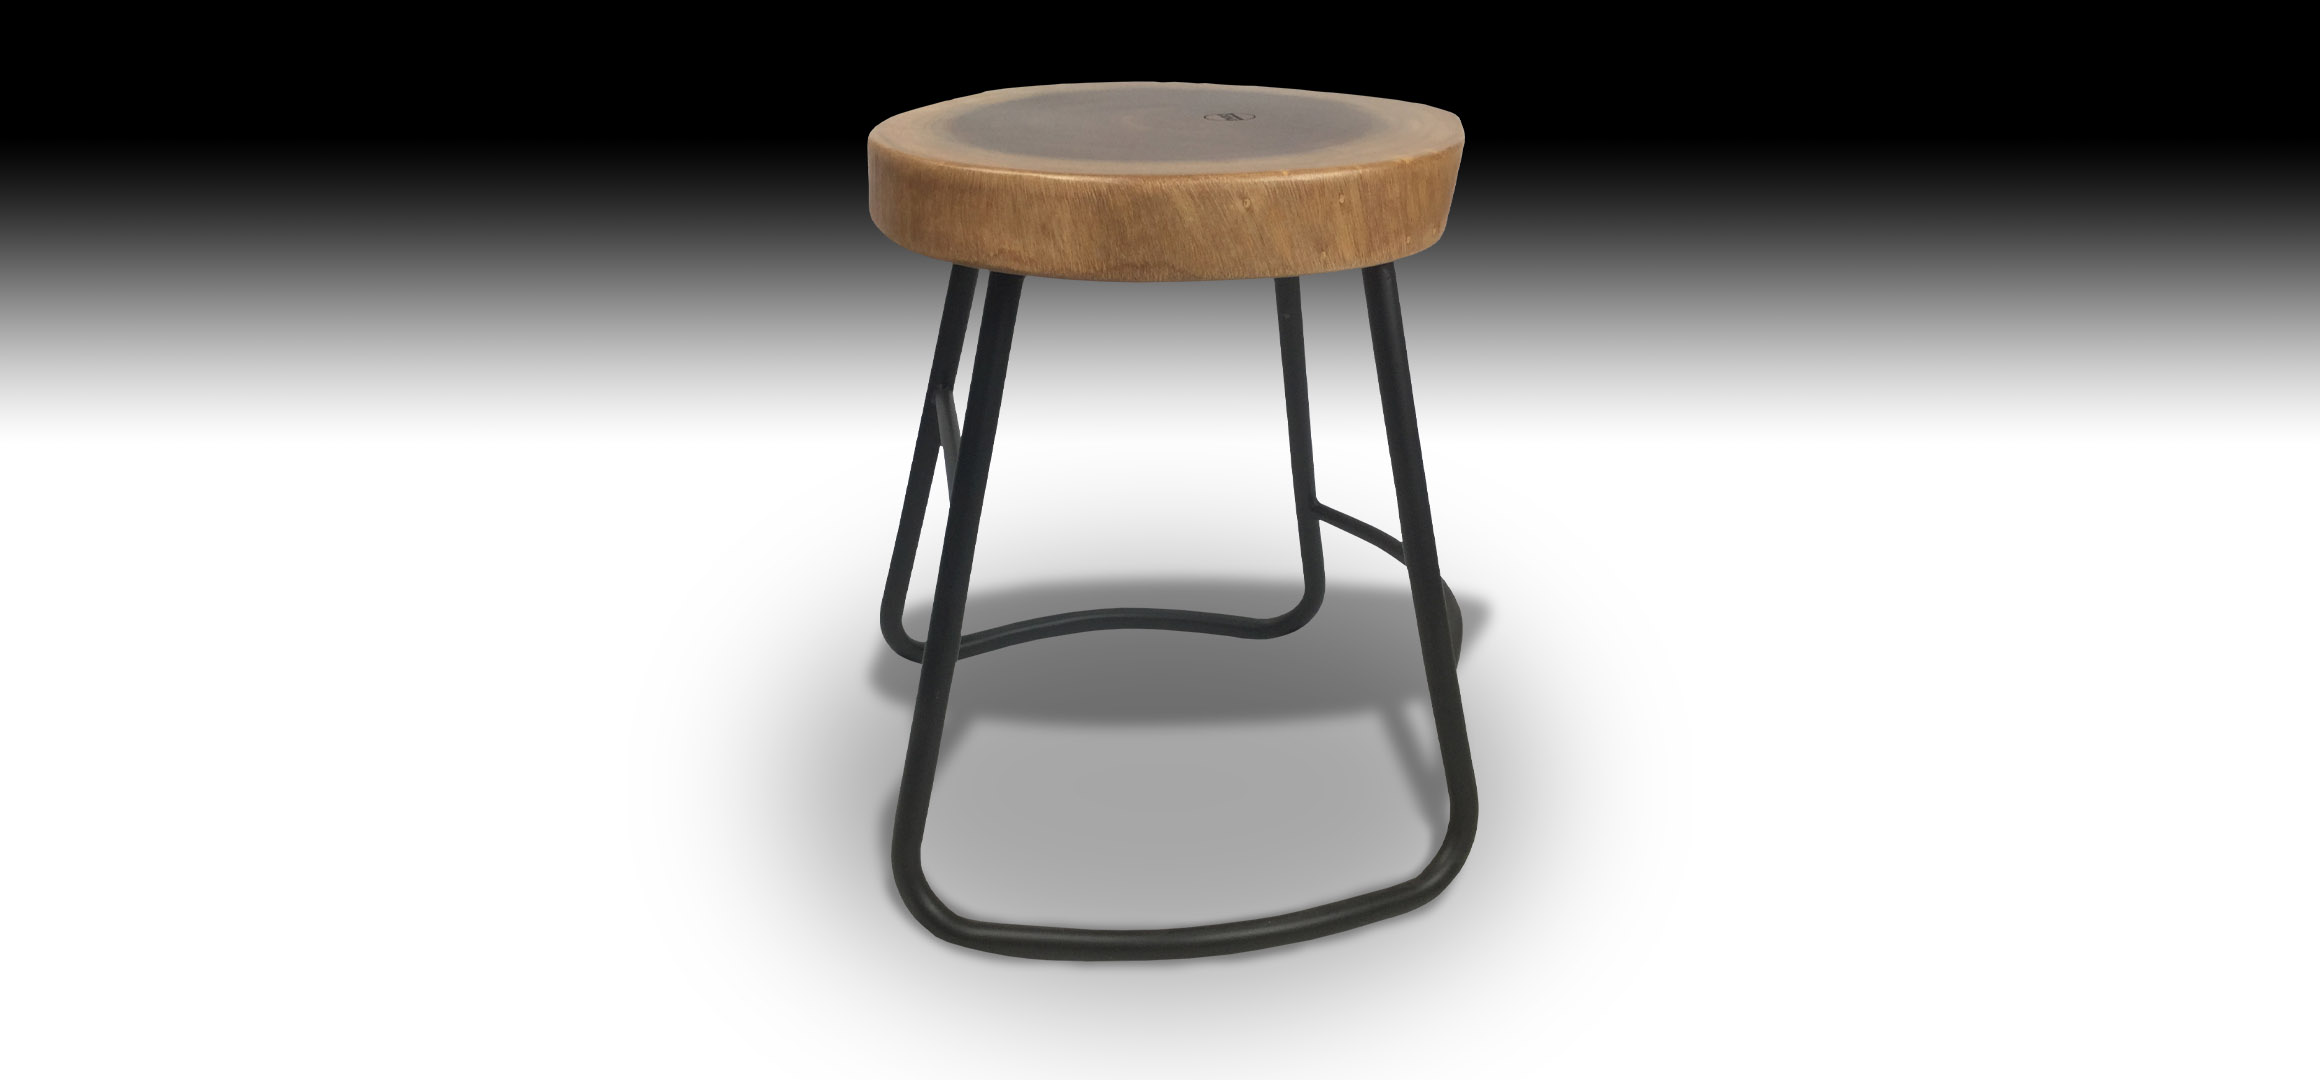 Julian Mahogany stool side view